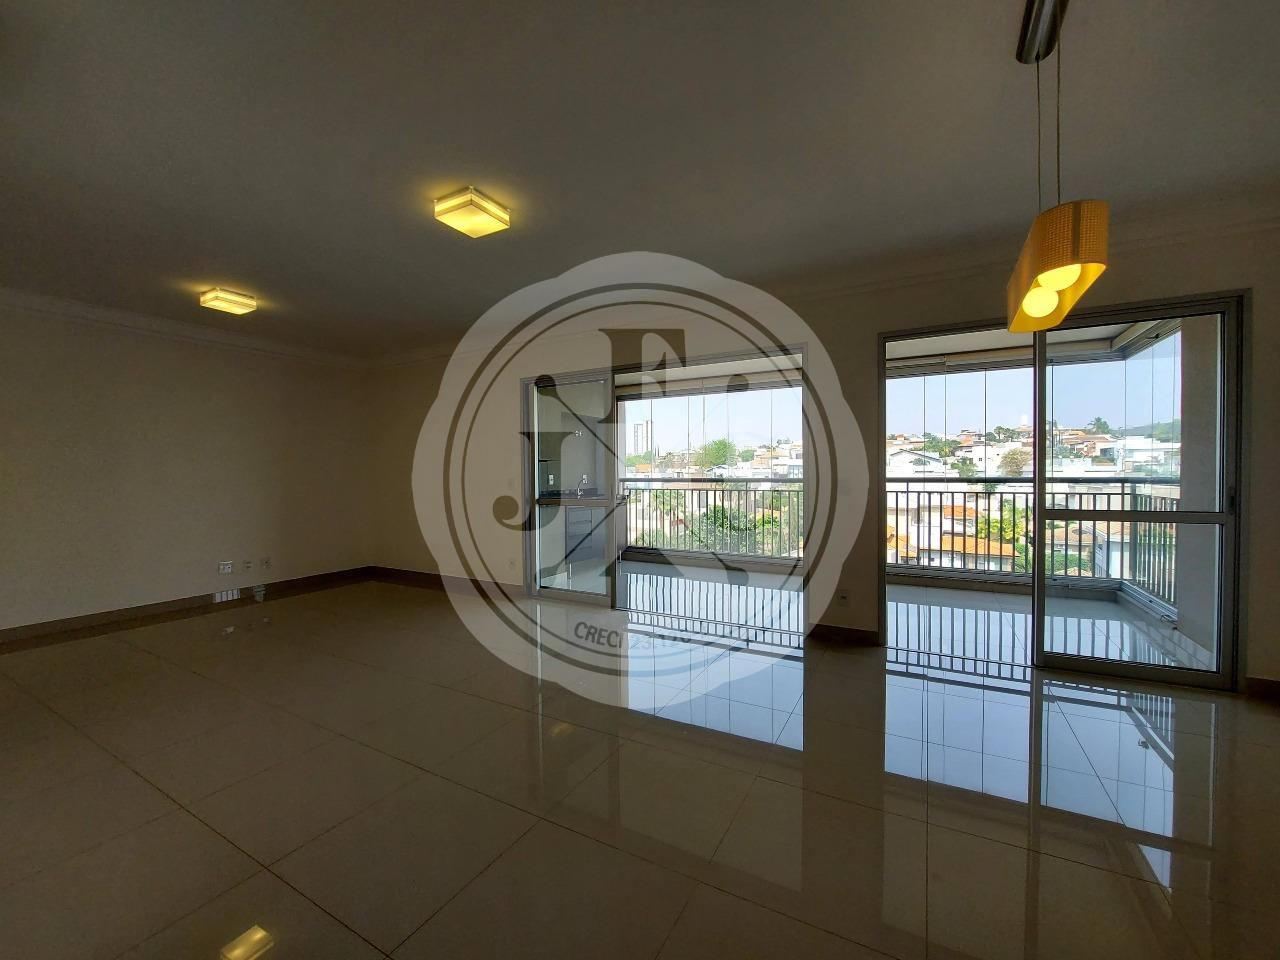 Exclusivo apartamento à venda no condomínio Les Alpes.